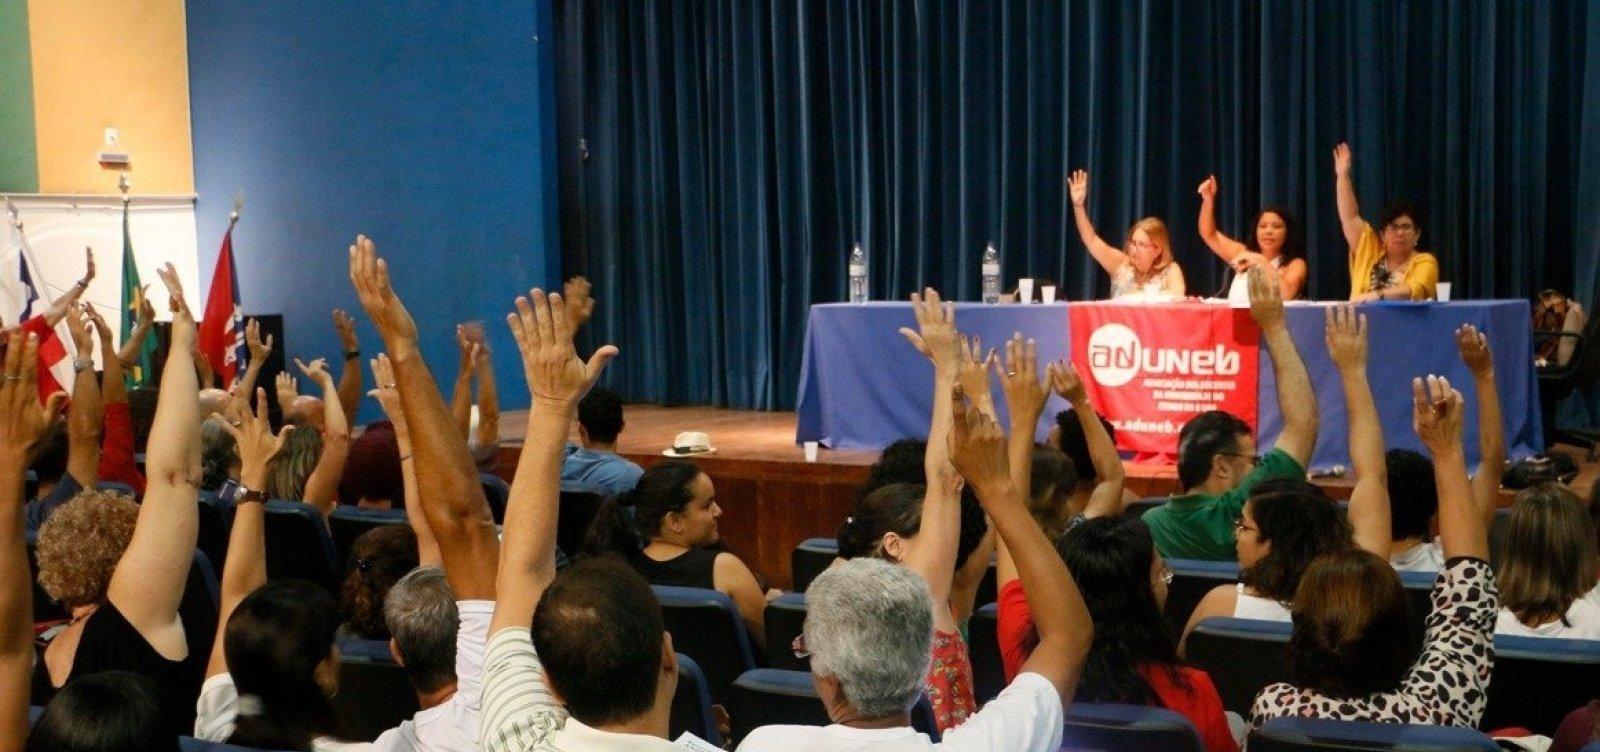 [Após assembleia, professores da Uneb decidem manter greve]